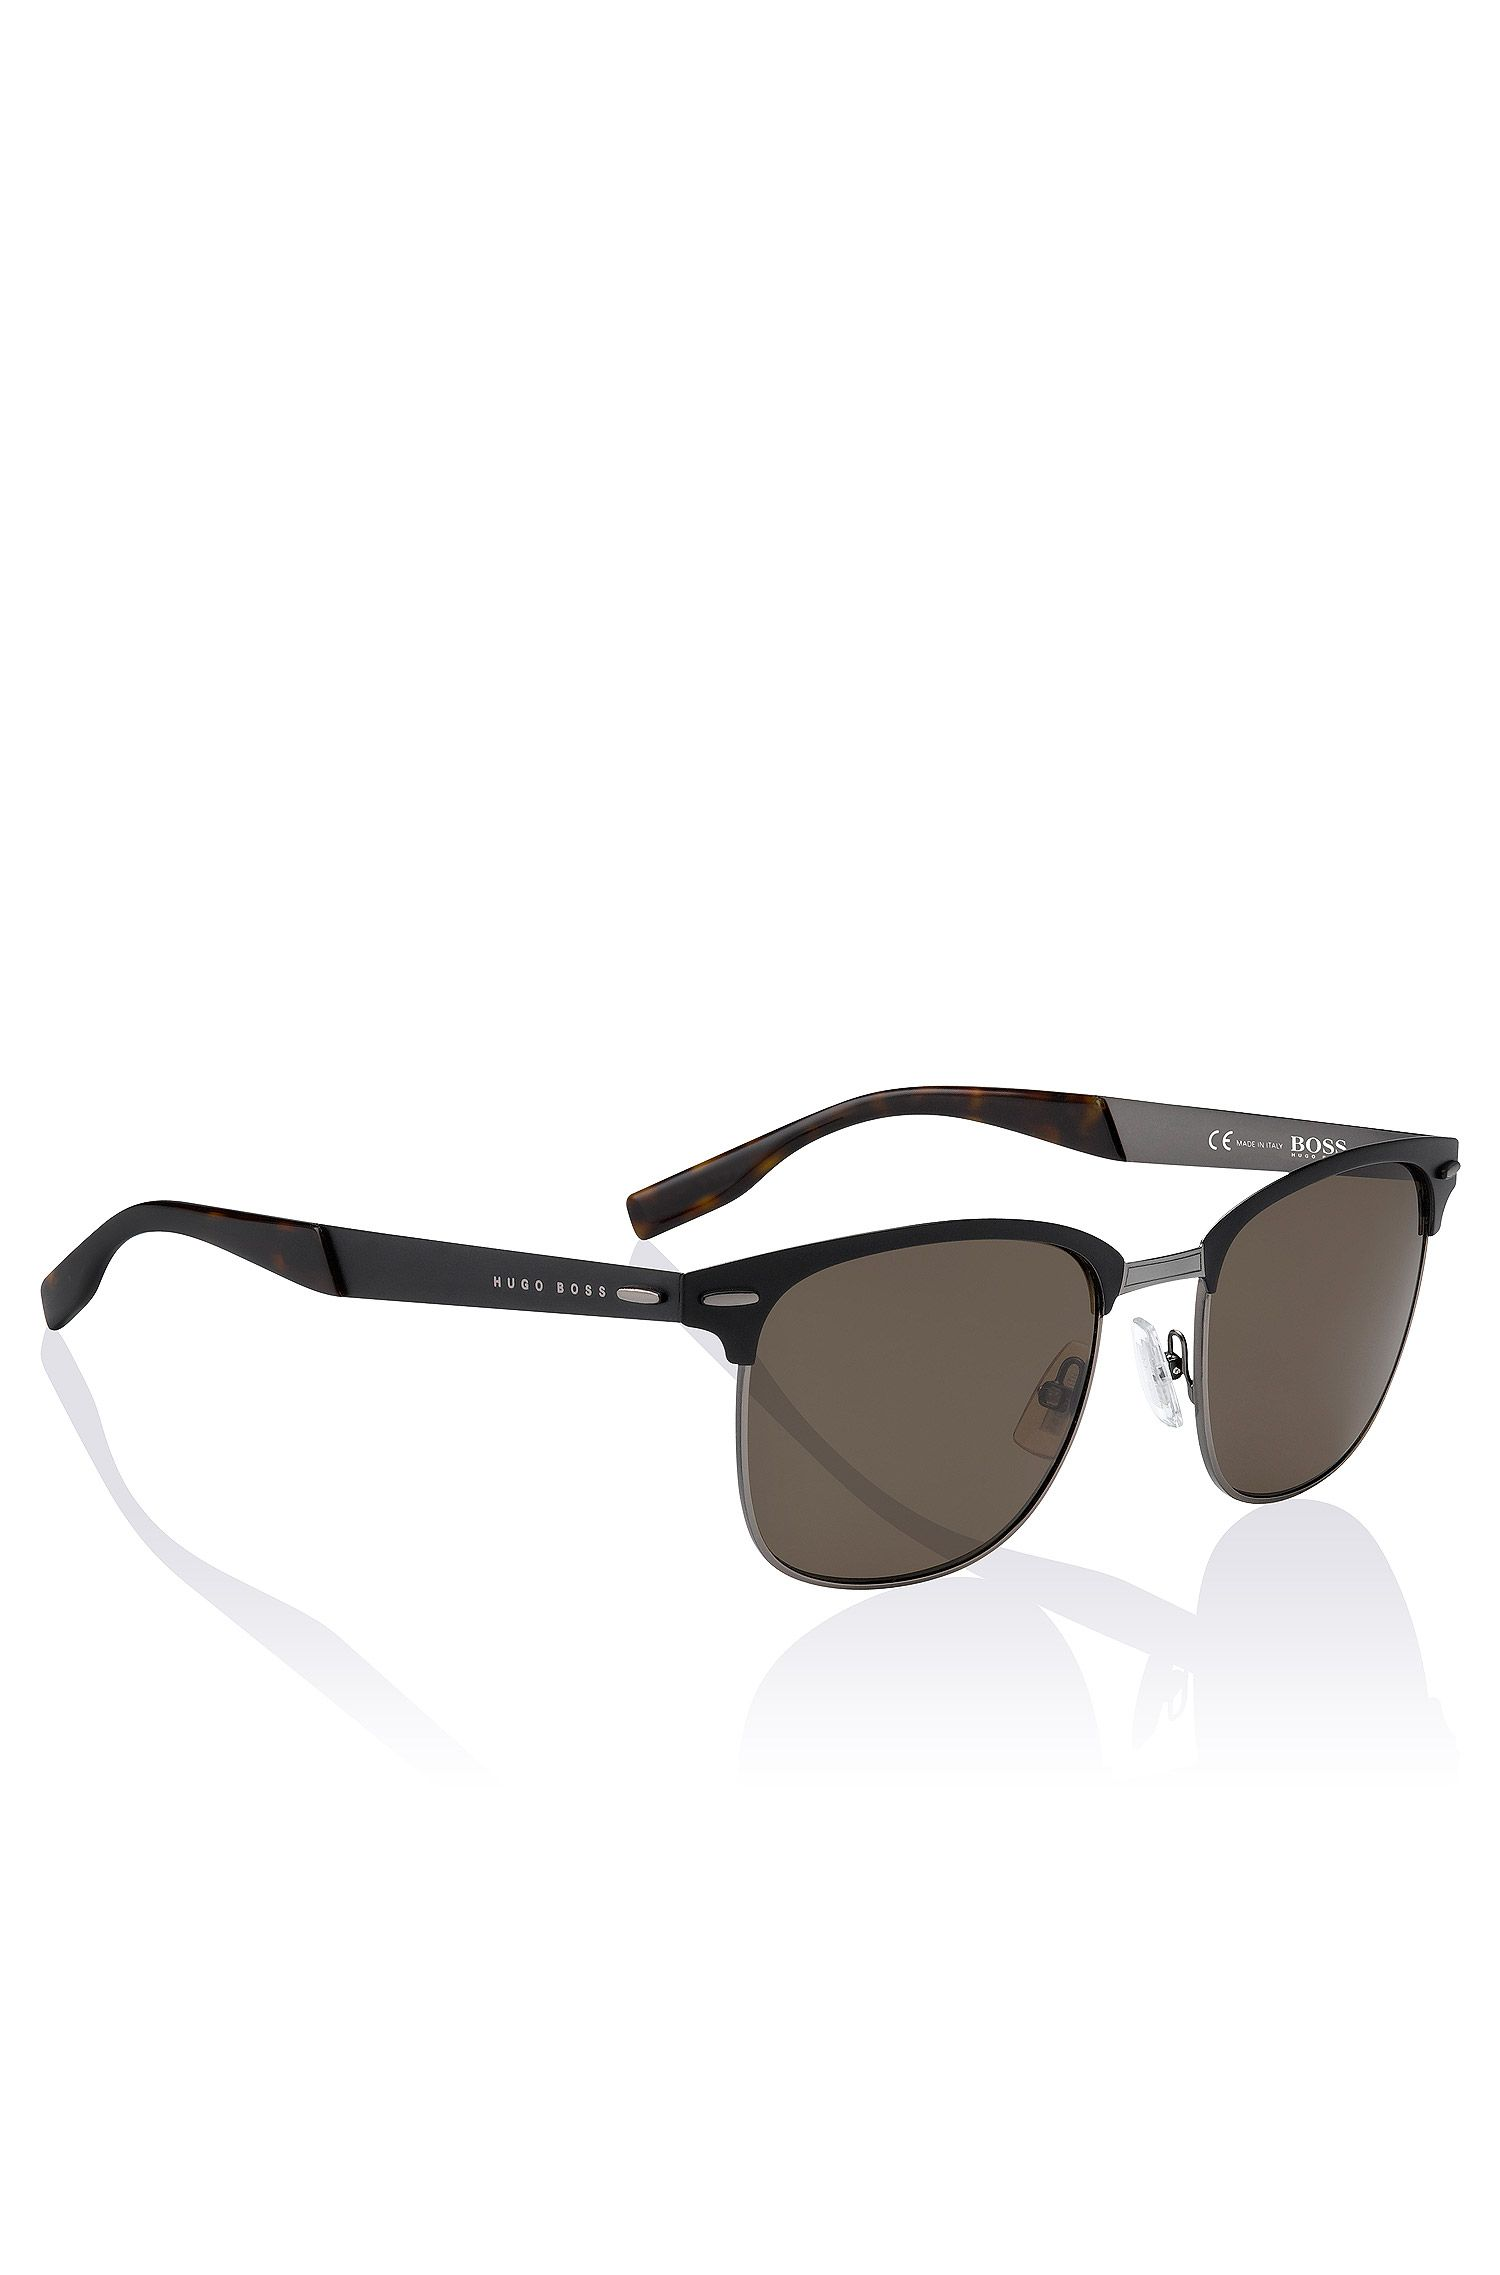 Gafas de sol 'BOSS 0595/S', Assorted-Pre-Pack